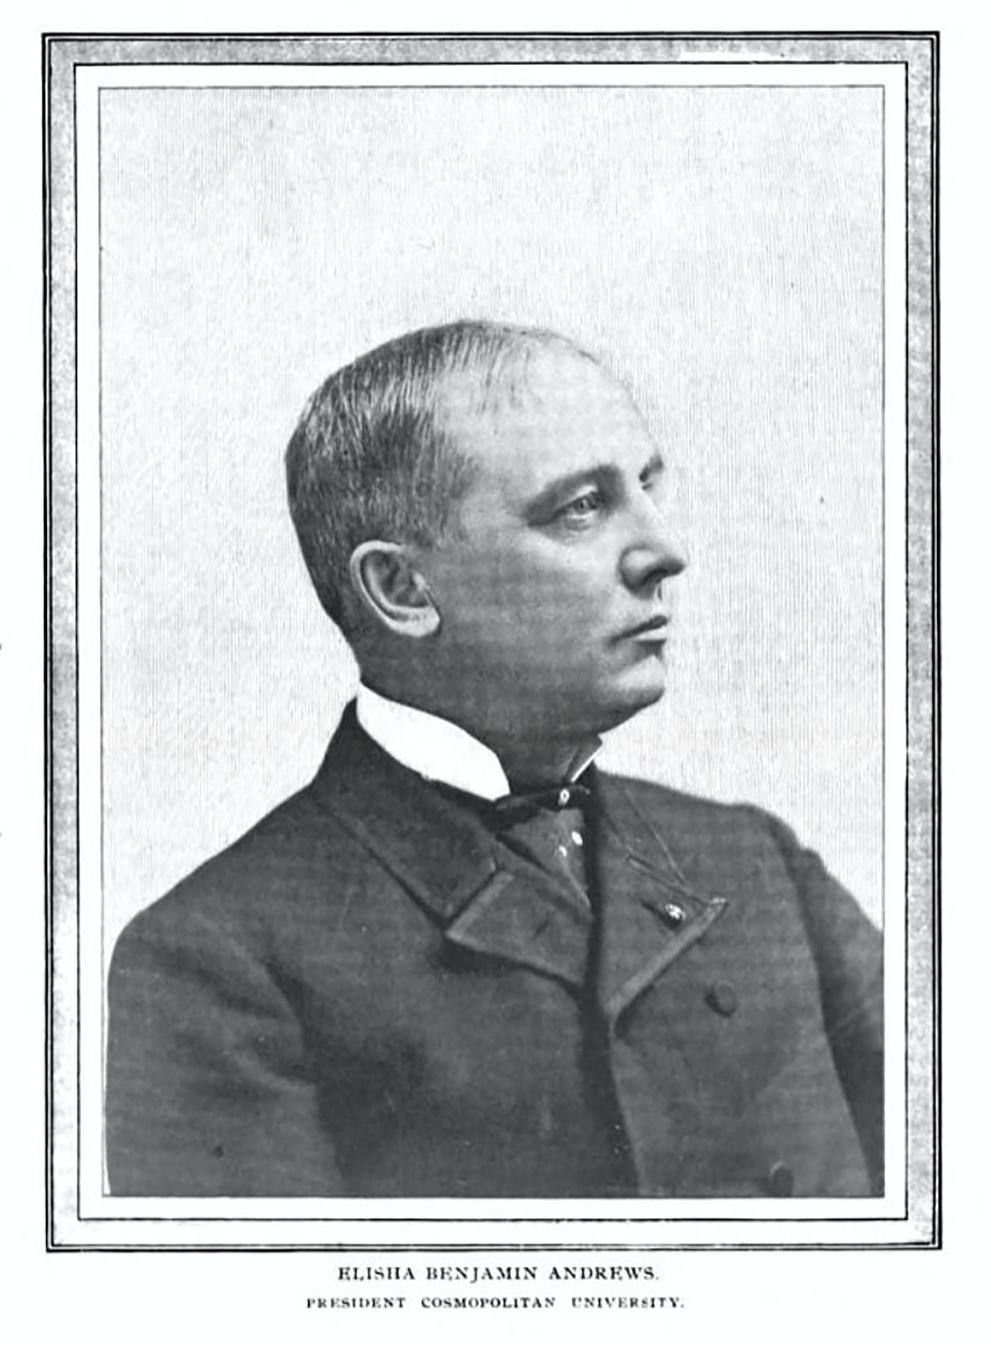 Image of Elisha Benjamin Andrews from The Cosmopolitan, 1897. Google Books.